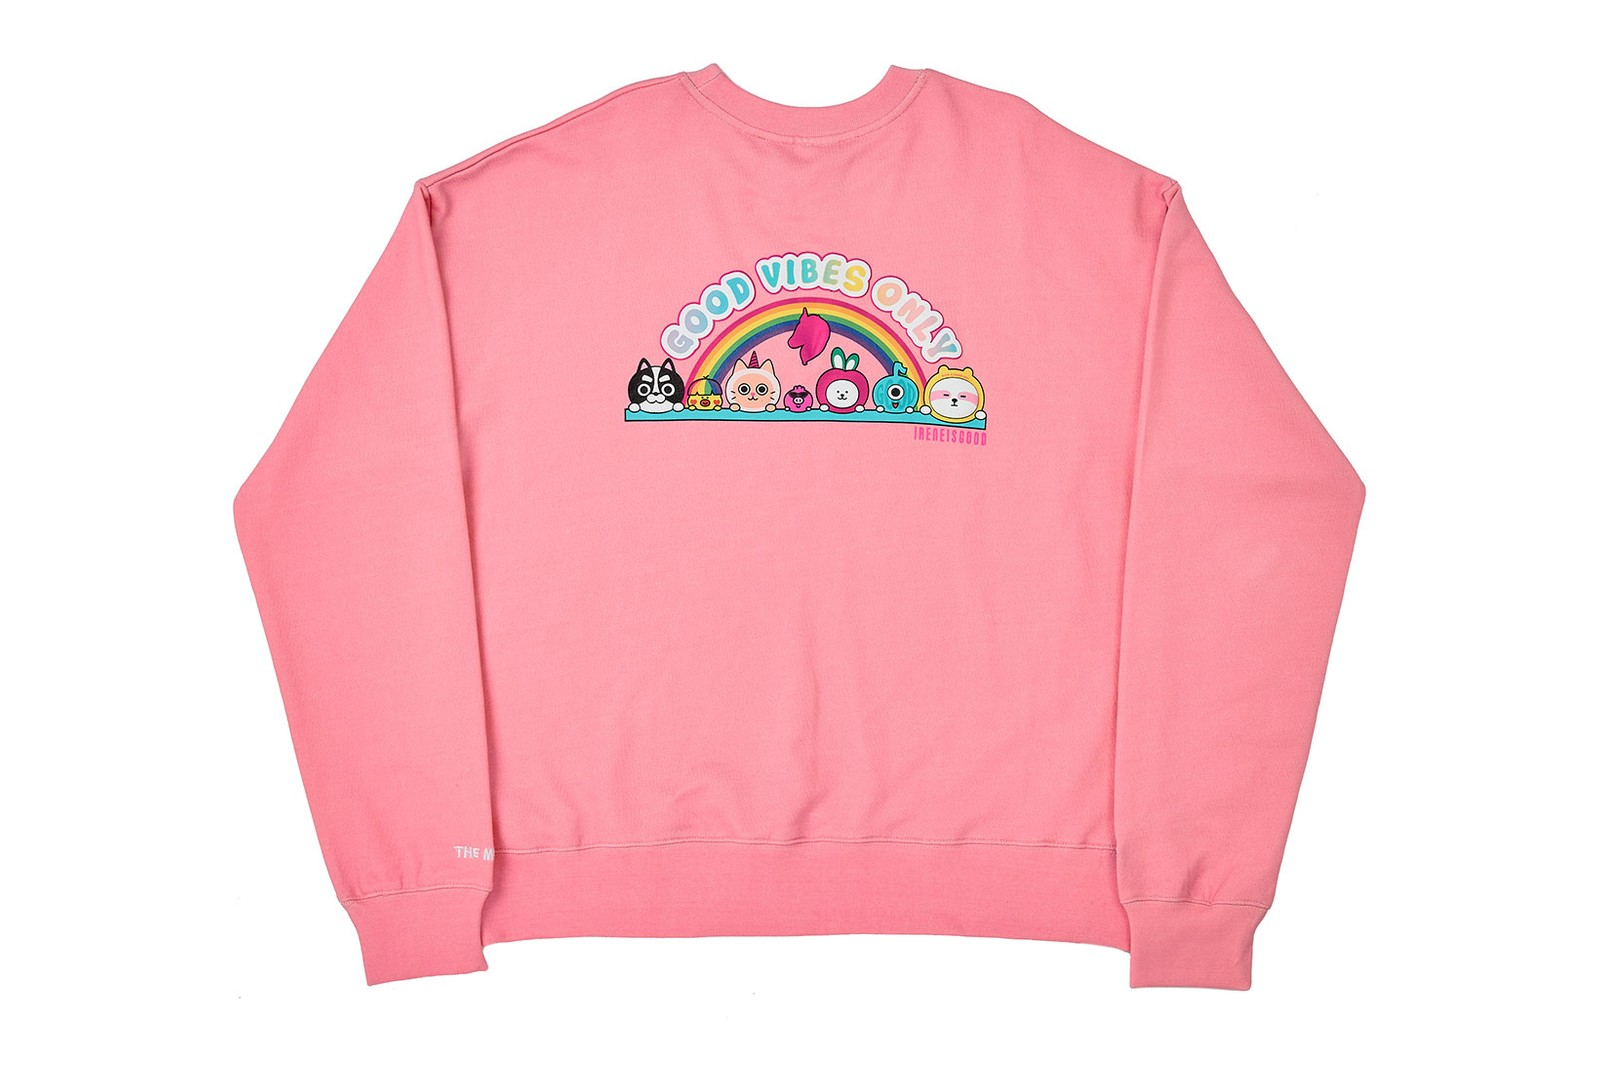 irene kim ireneisgood label tiktok friends character collaboration rainbow tie-dye unicorns hoodies t-shirts sweatshirts beanies